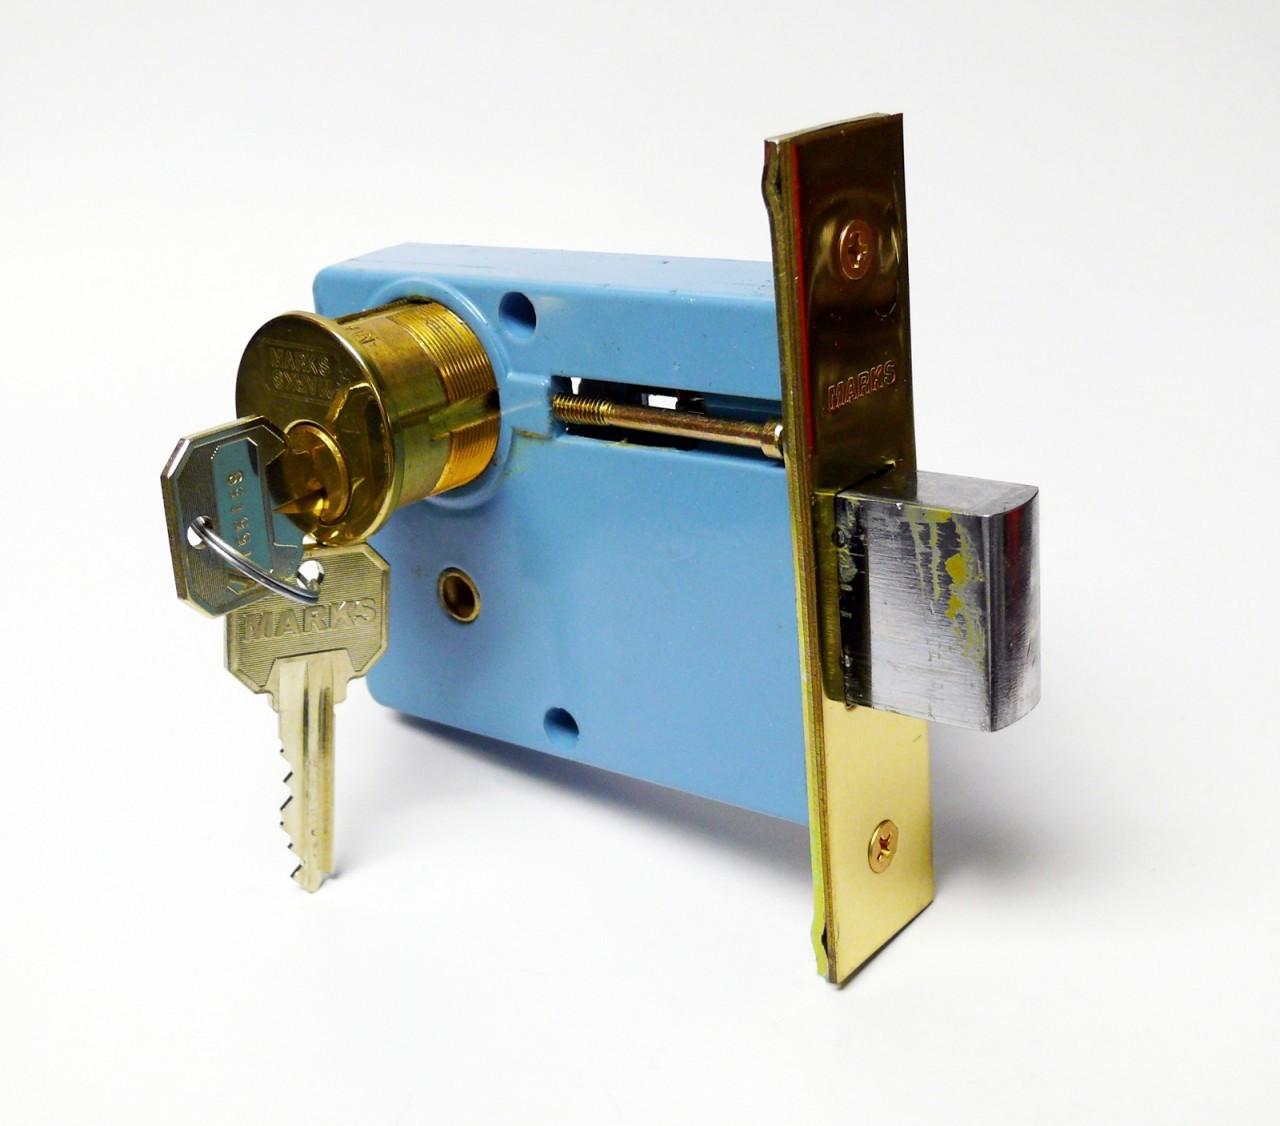 Marks 3000 Brass Mortise Deadbolt Safeandlockstore Com